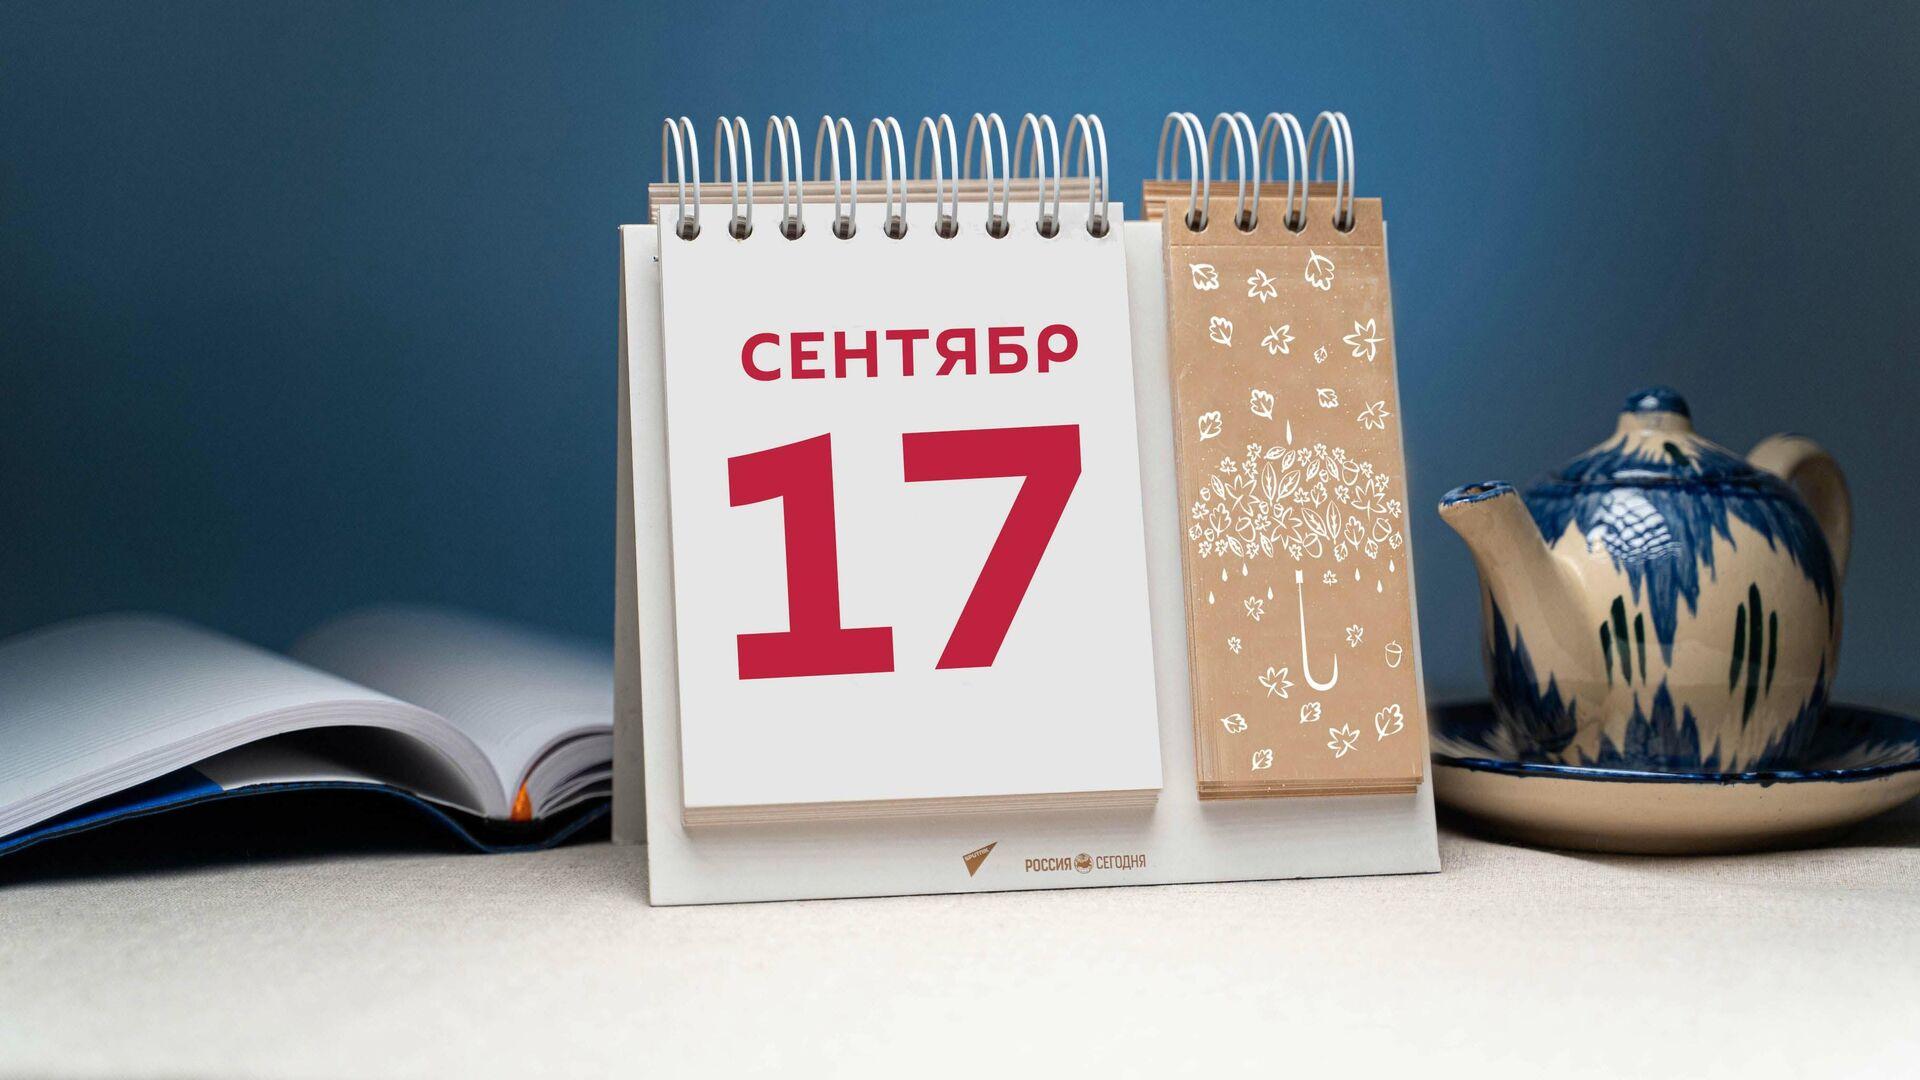 День 17 сентября - Sputnik Тоҷикистон, 1920, 17.09.2021